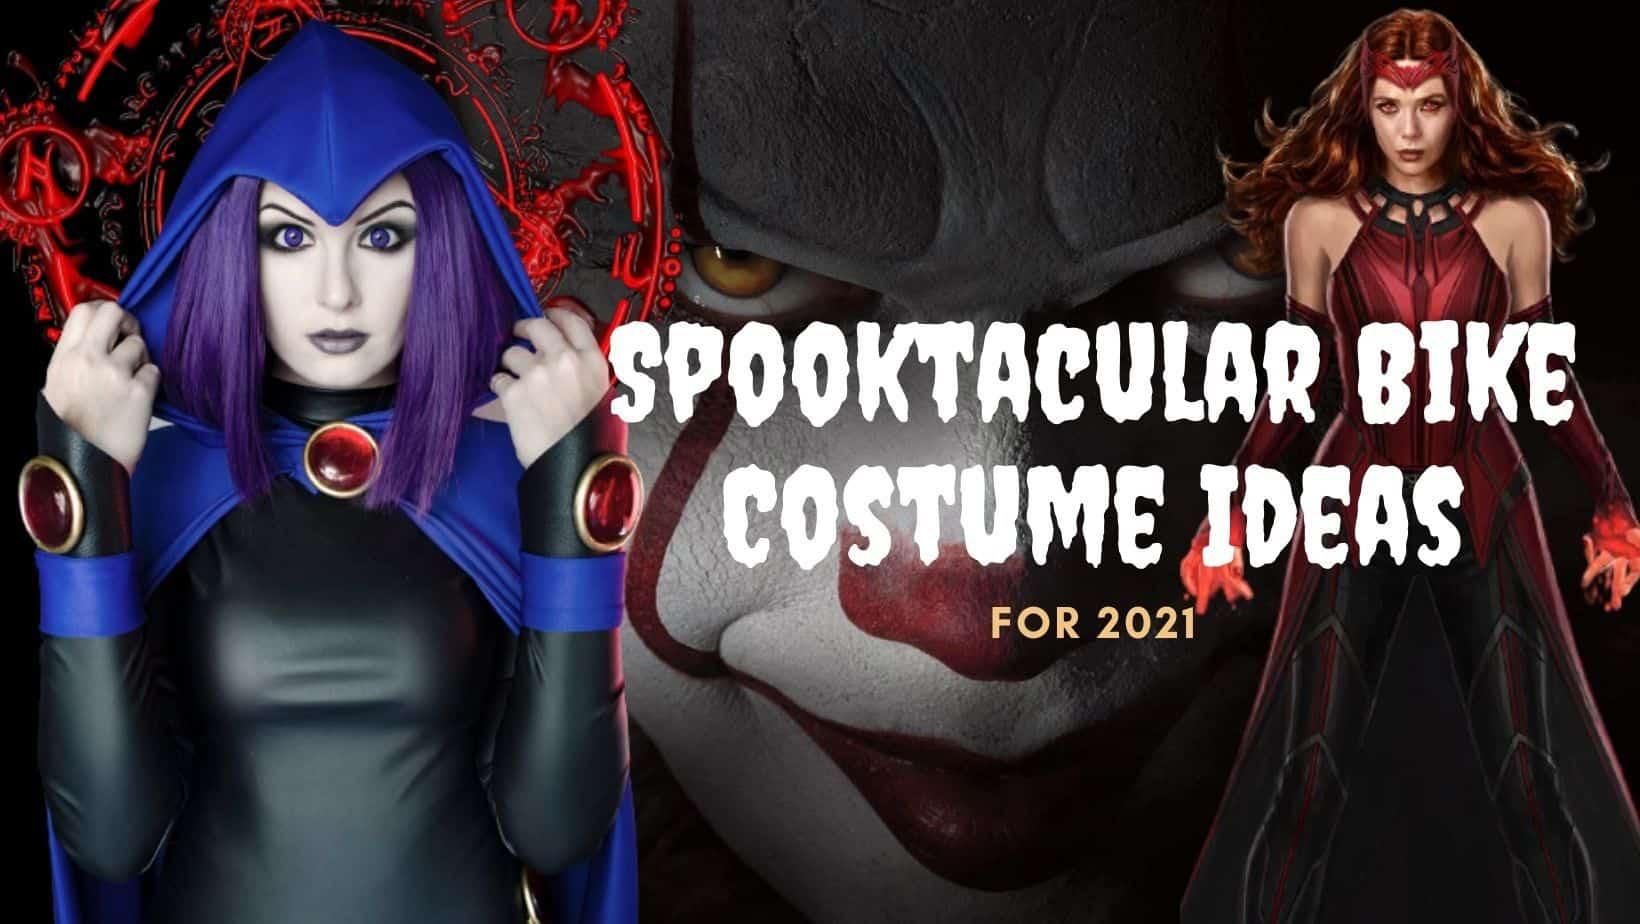 Spooktacular Bike Halloween Costume Ideas For 2021